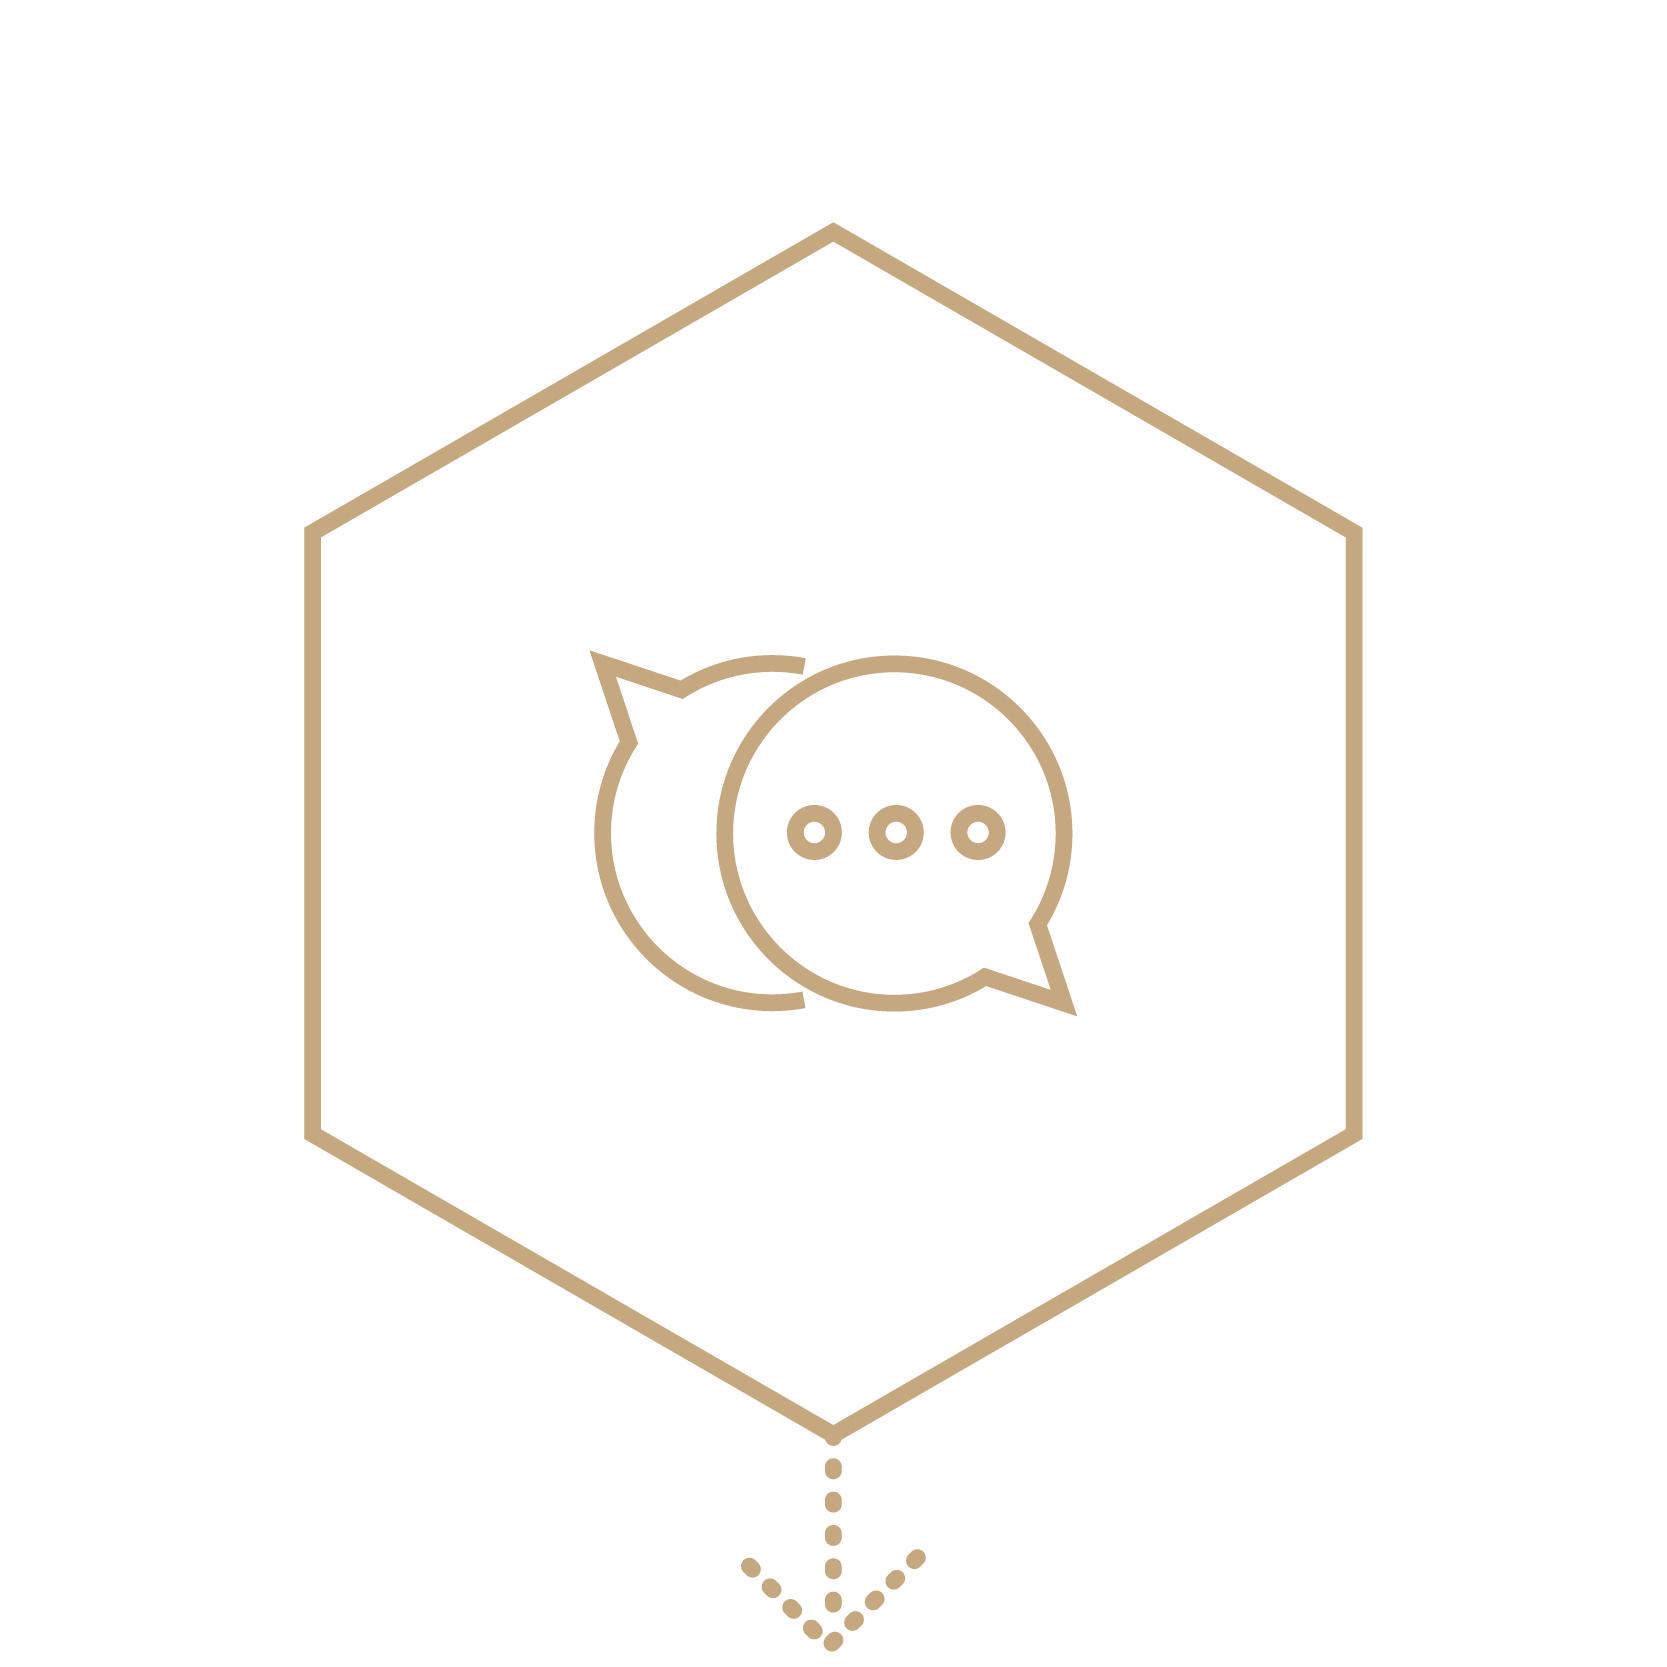 icon-set-lijntje-03.png